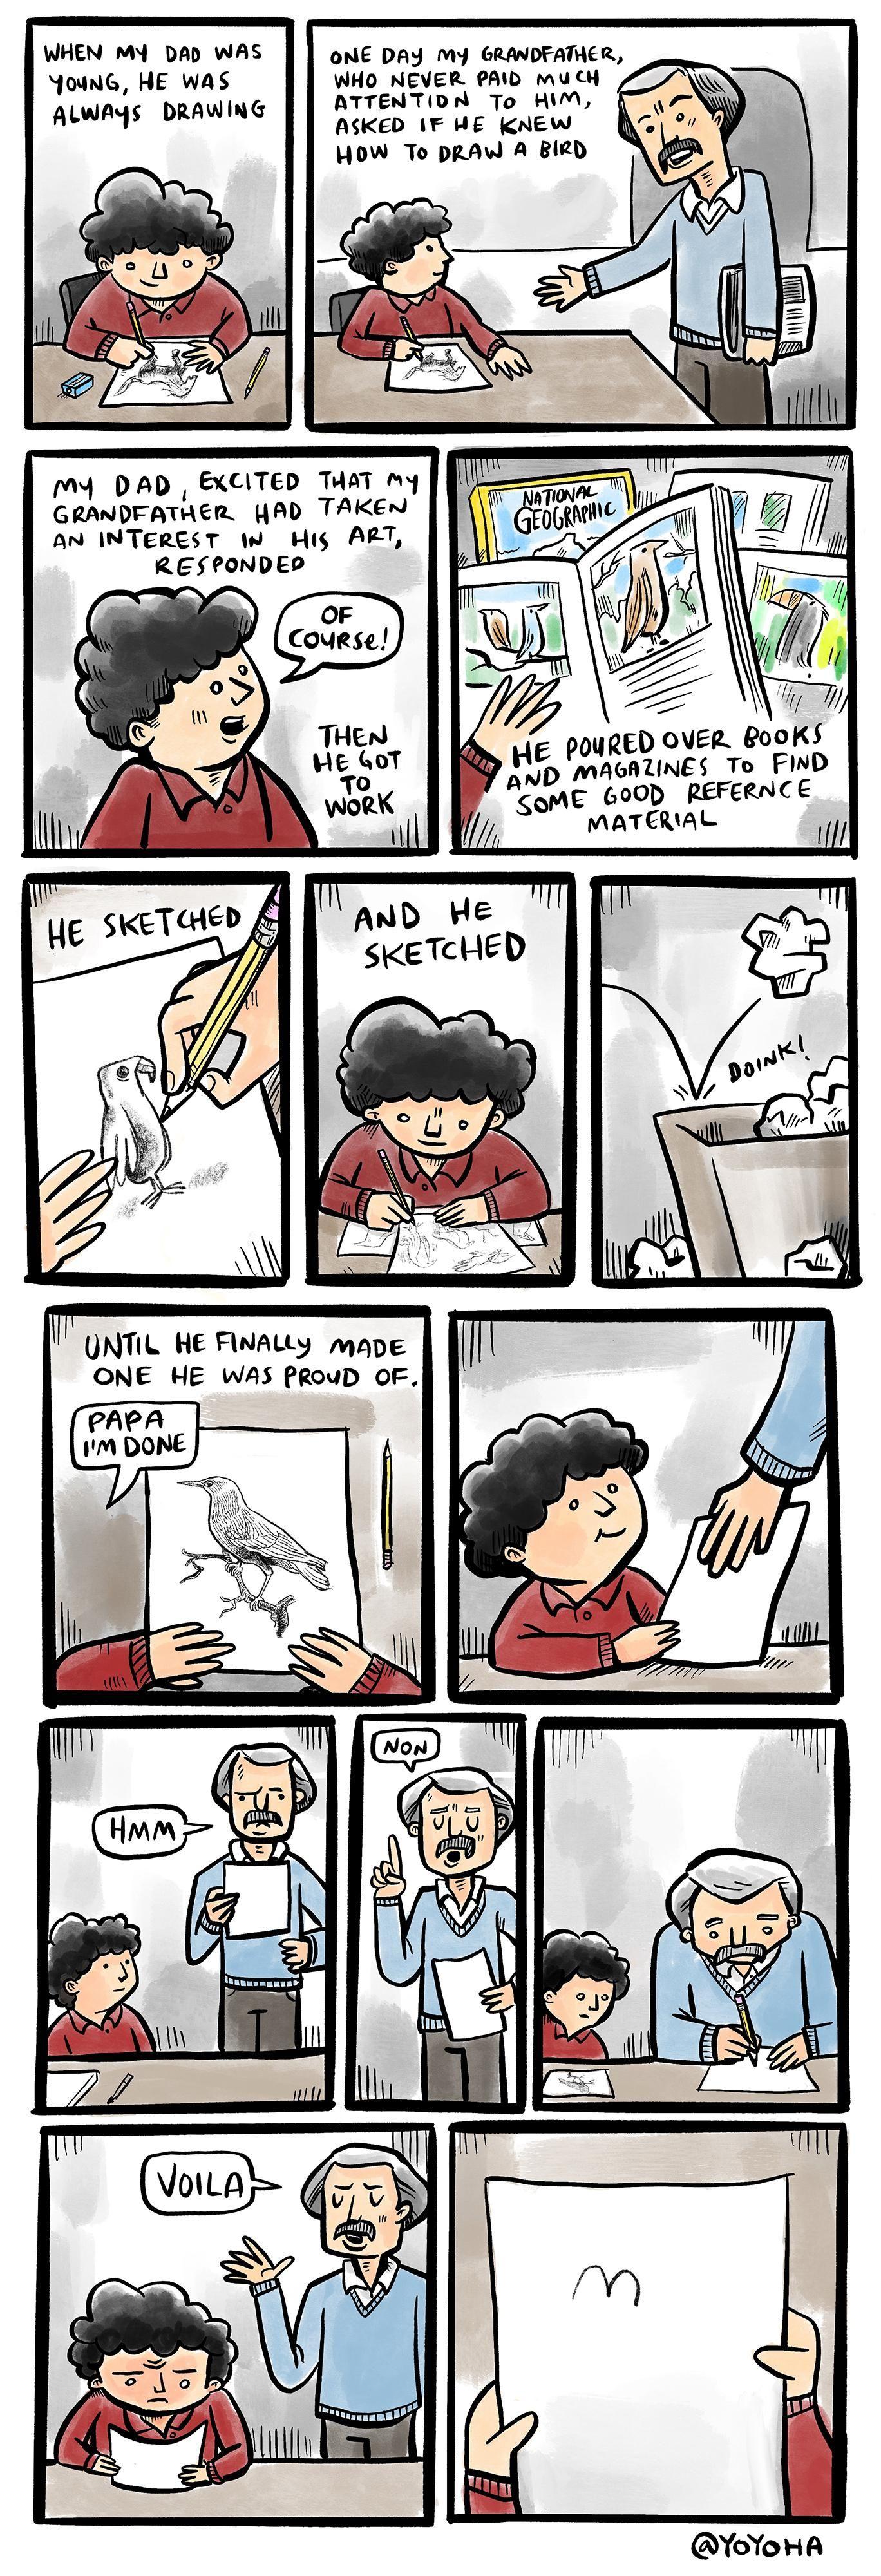 how to draw a bird: a true story